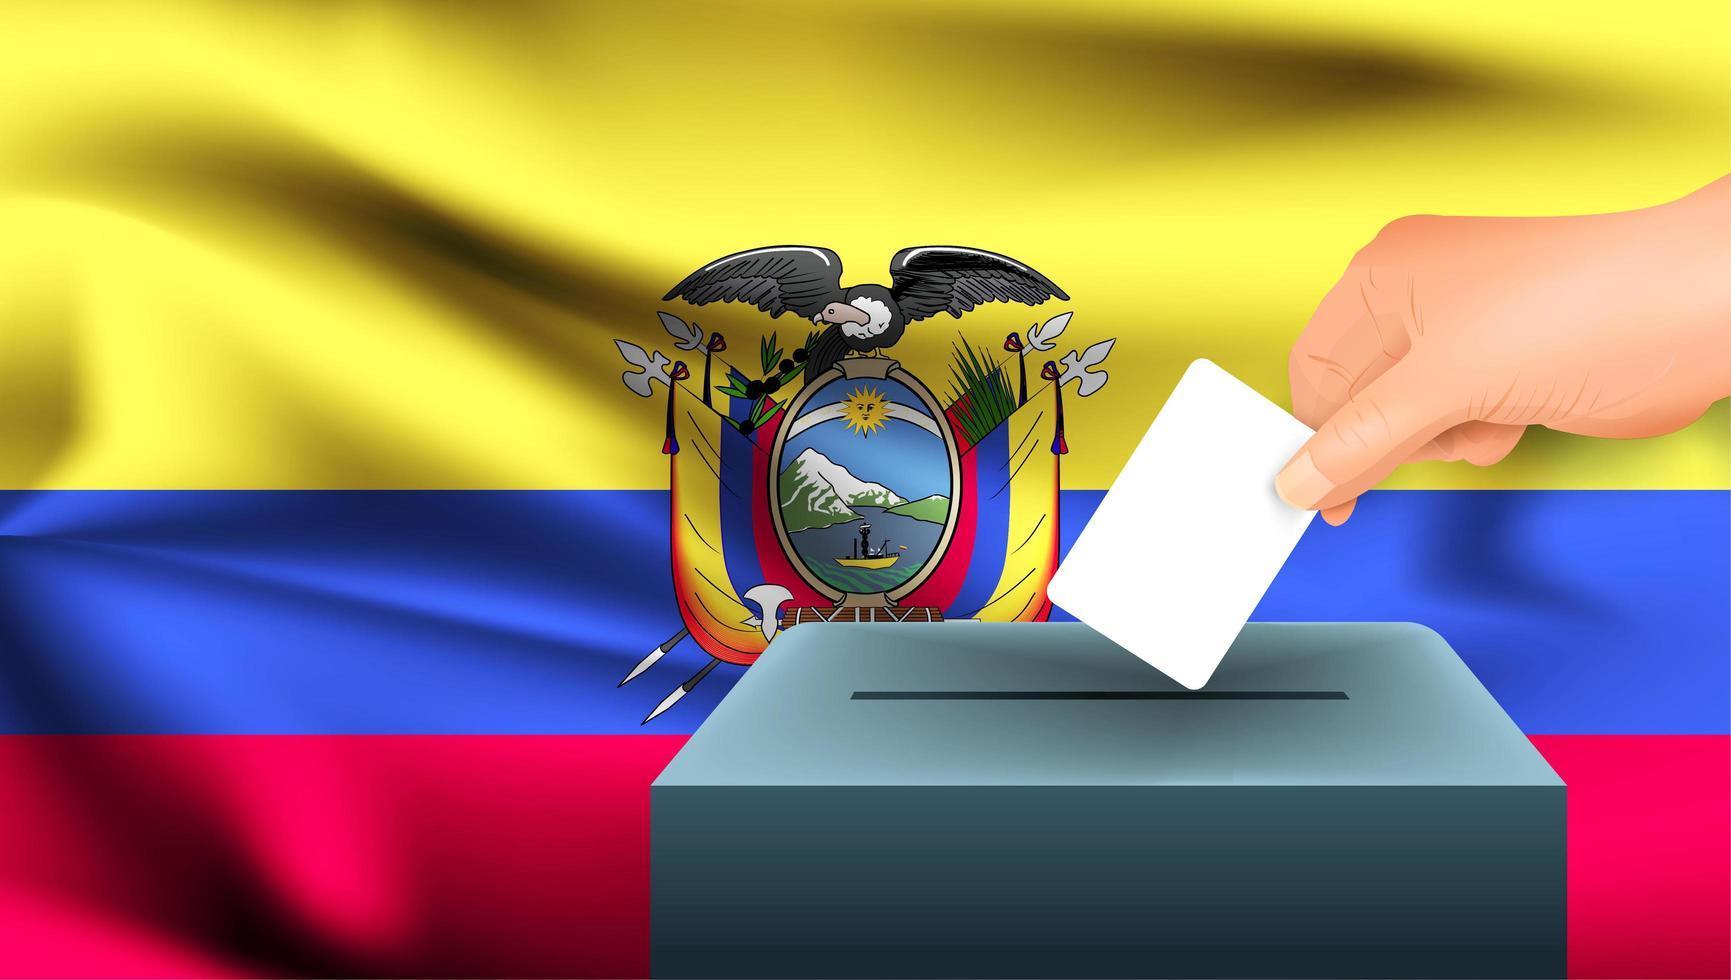 Hand putting ballot into box with Equadorian flag vector